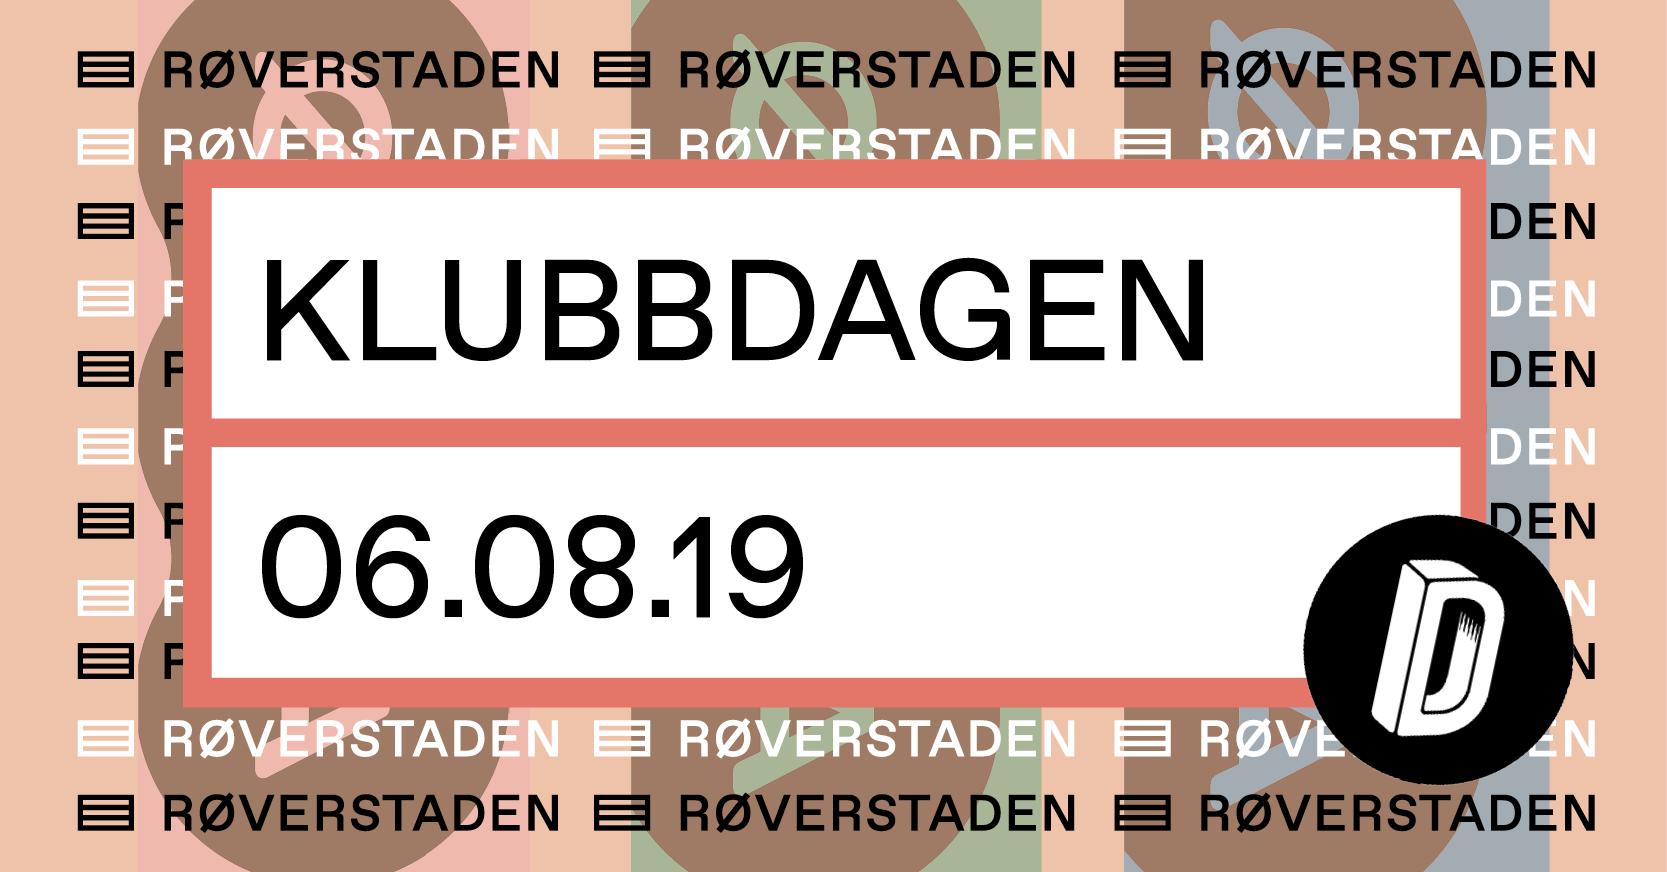 190806_Klubbdagen-Roverstaden_facbook_event_mal_1200x628px_Forside.png